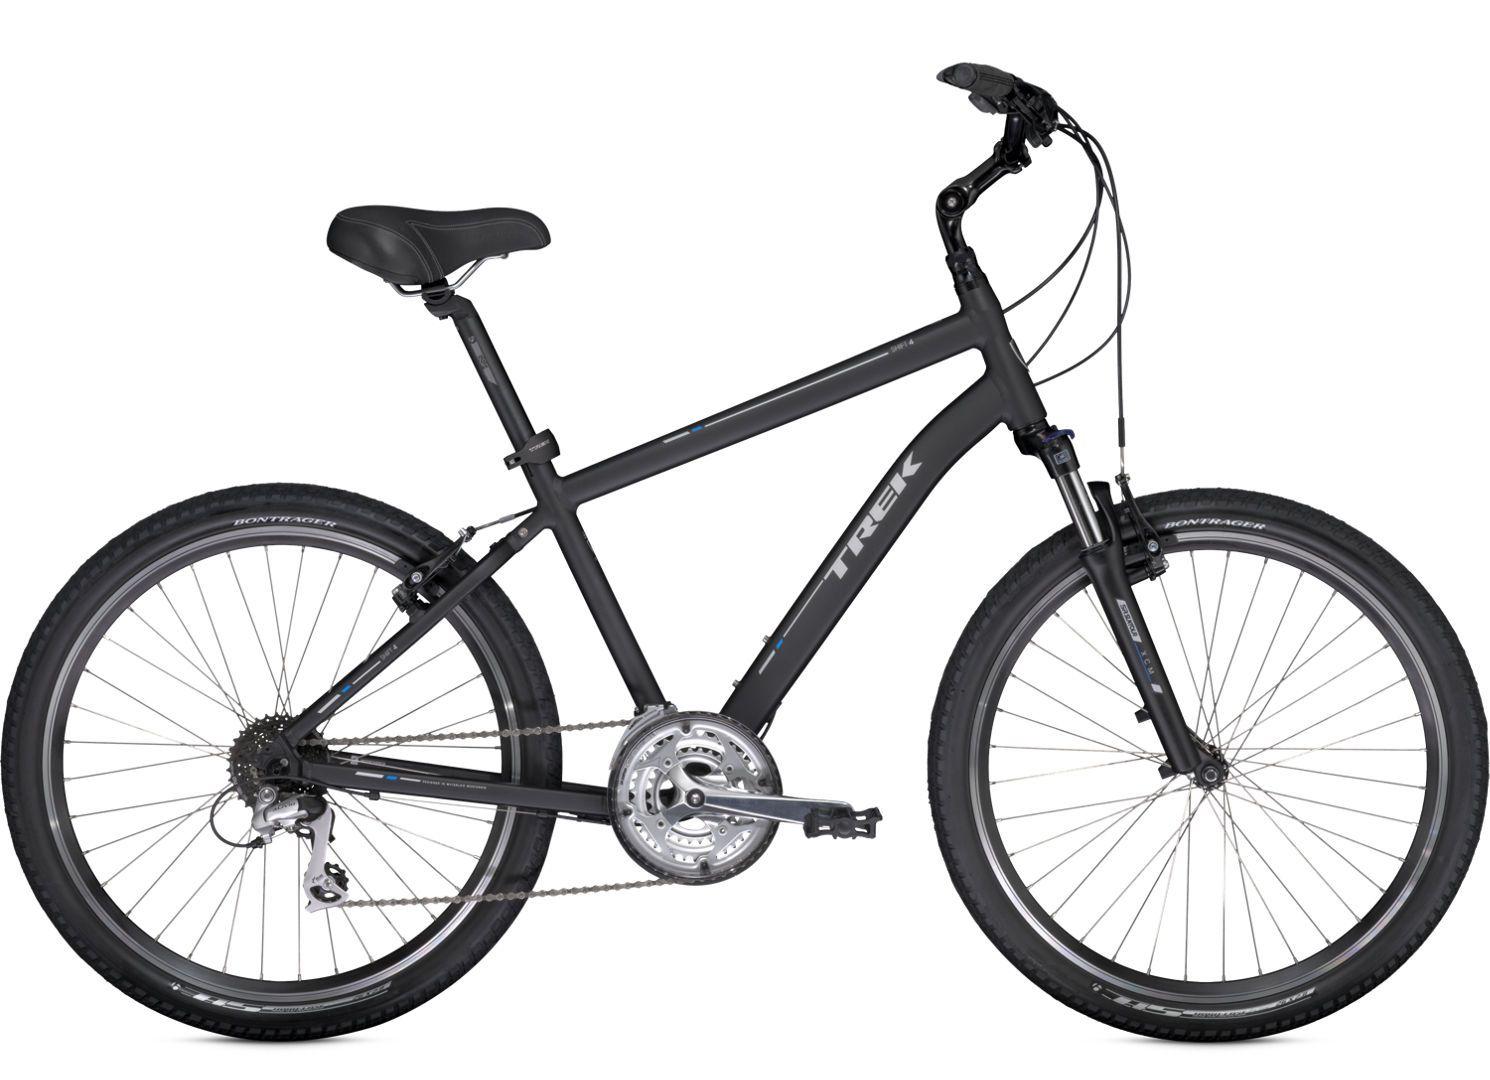 Shift 4 Trek Bicycle Trek Bicycle Trek Bikes Comfort Bike